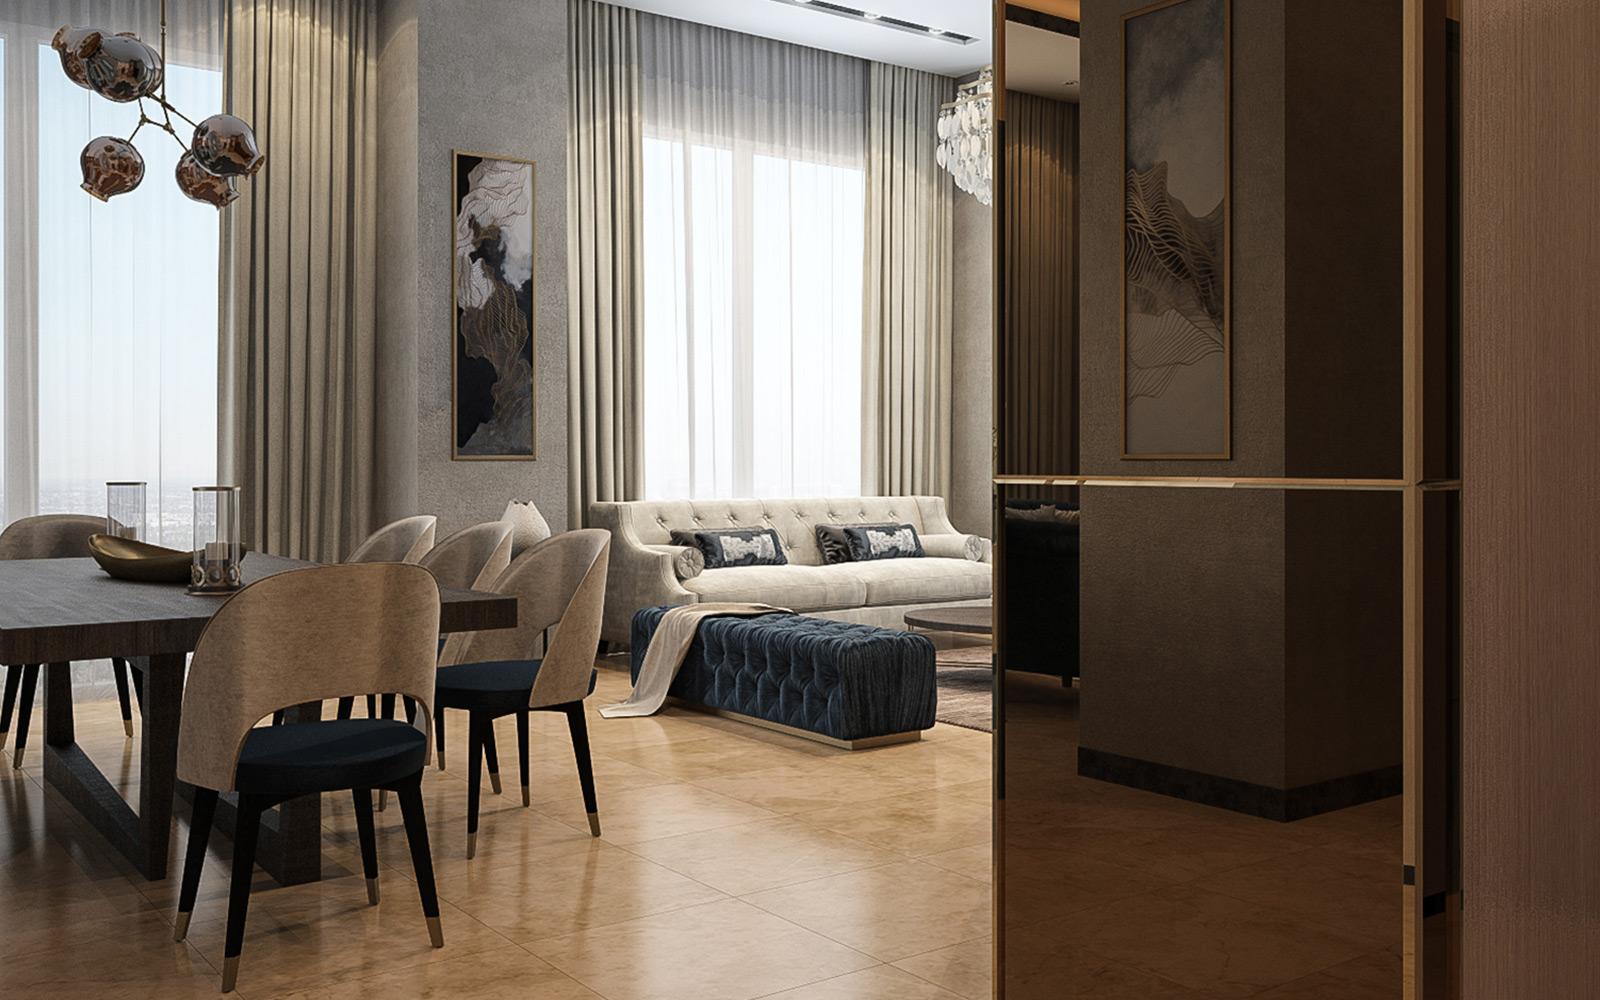 Vogue Design - Istanbul Basaksehir Flat3